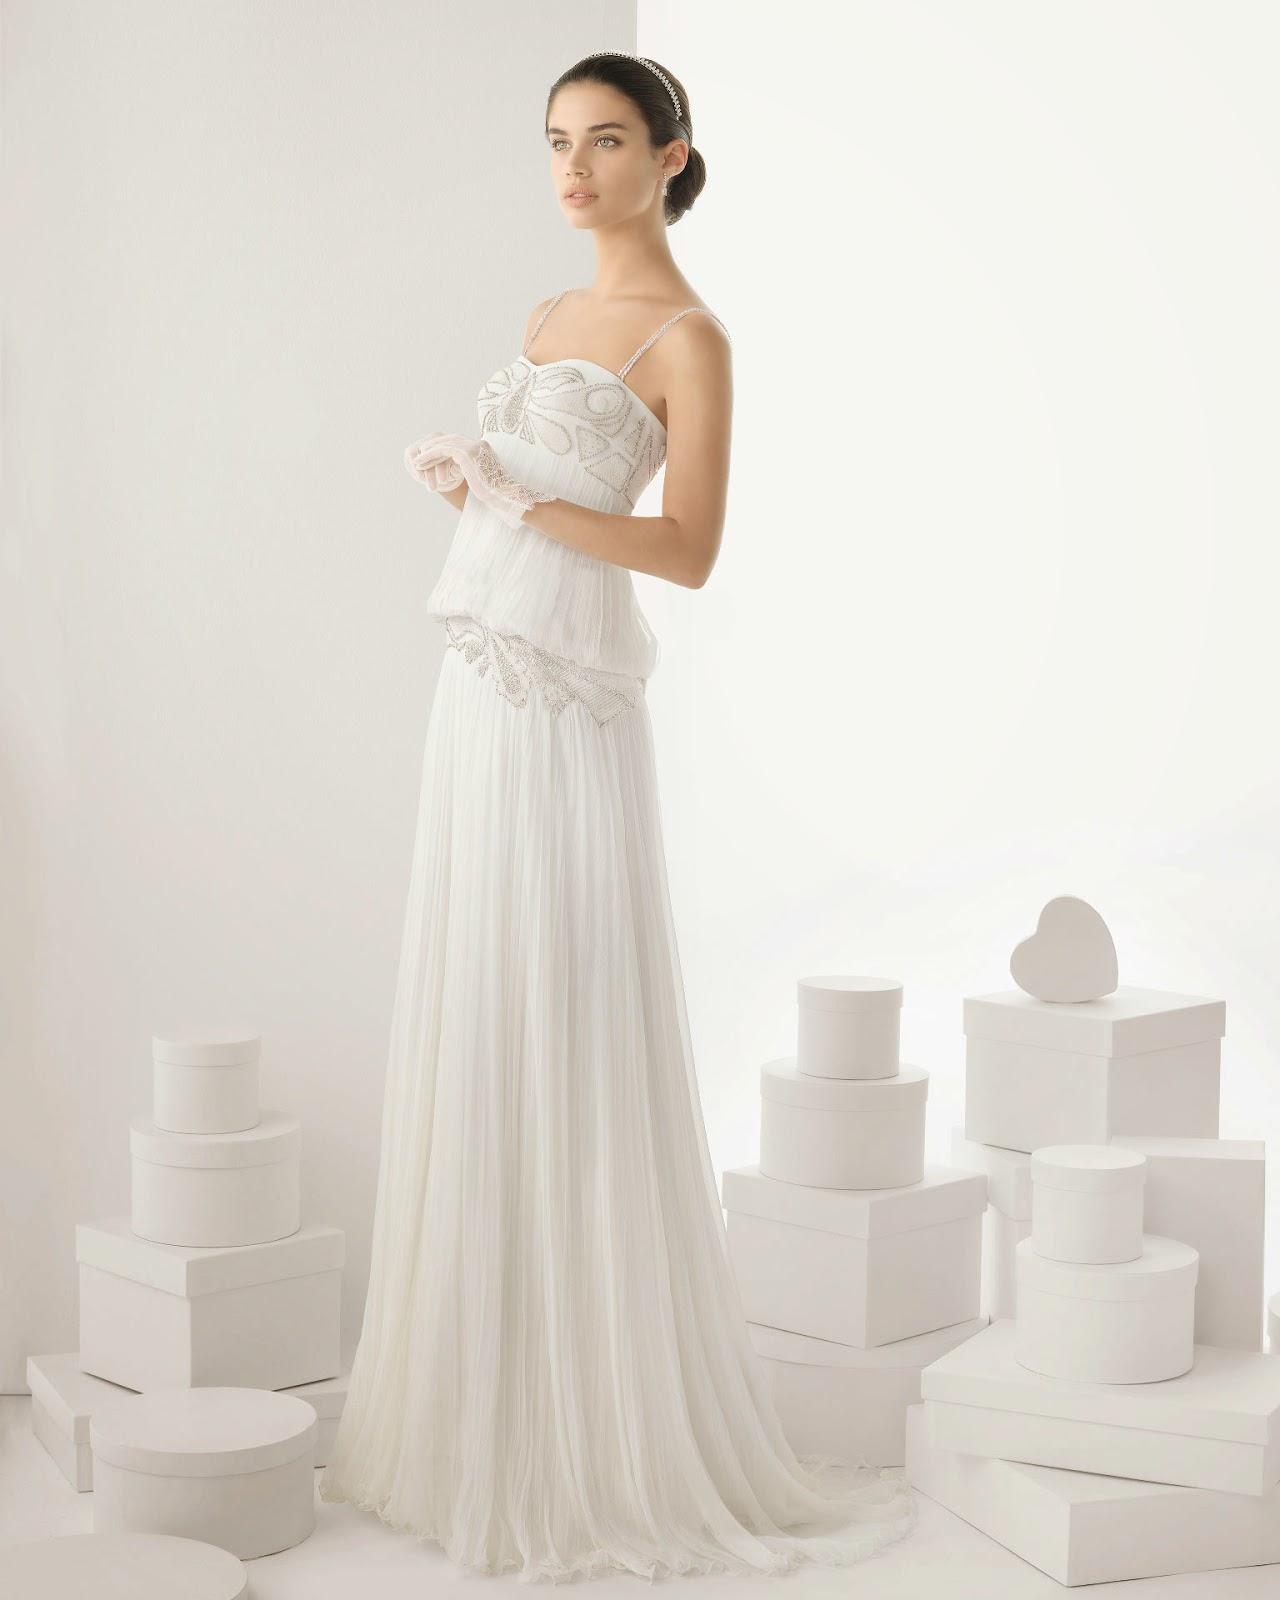 bcd3260b5 Vestidos De Novia Para Embarazadas De 5 Meses